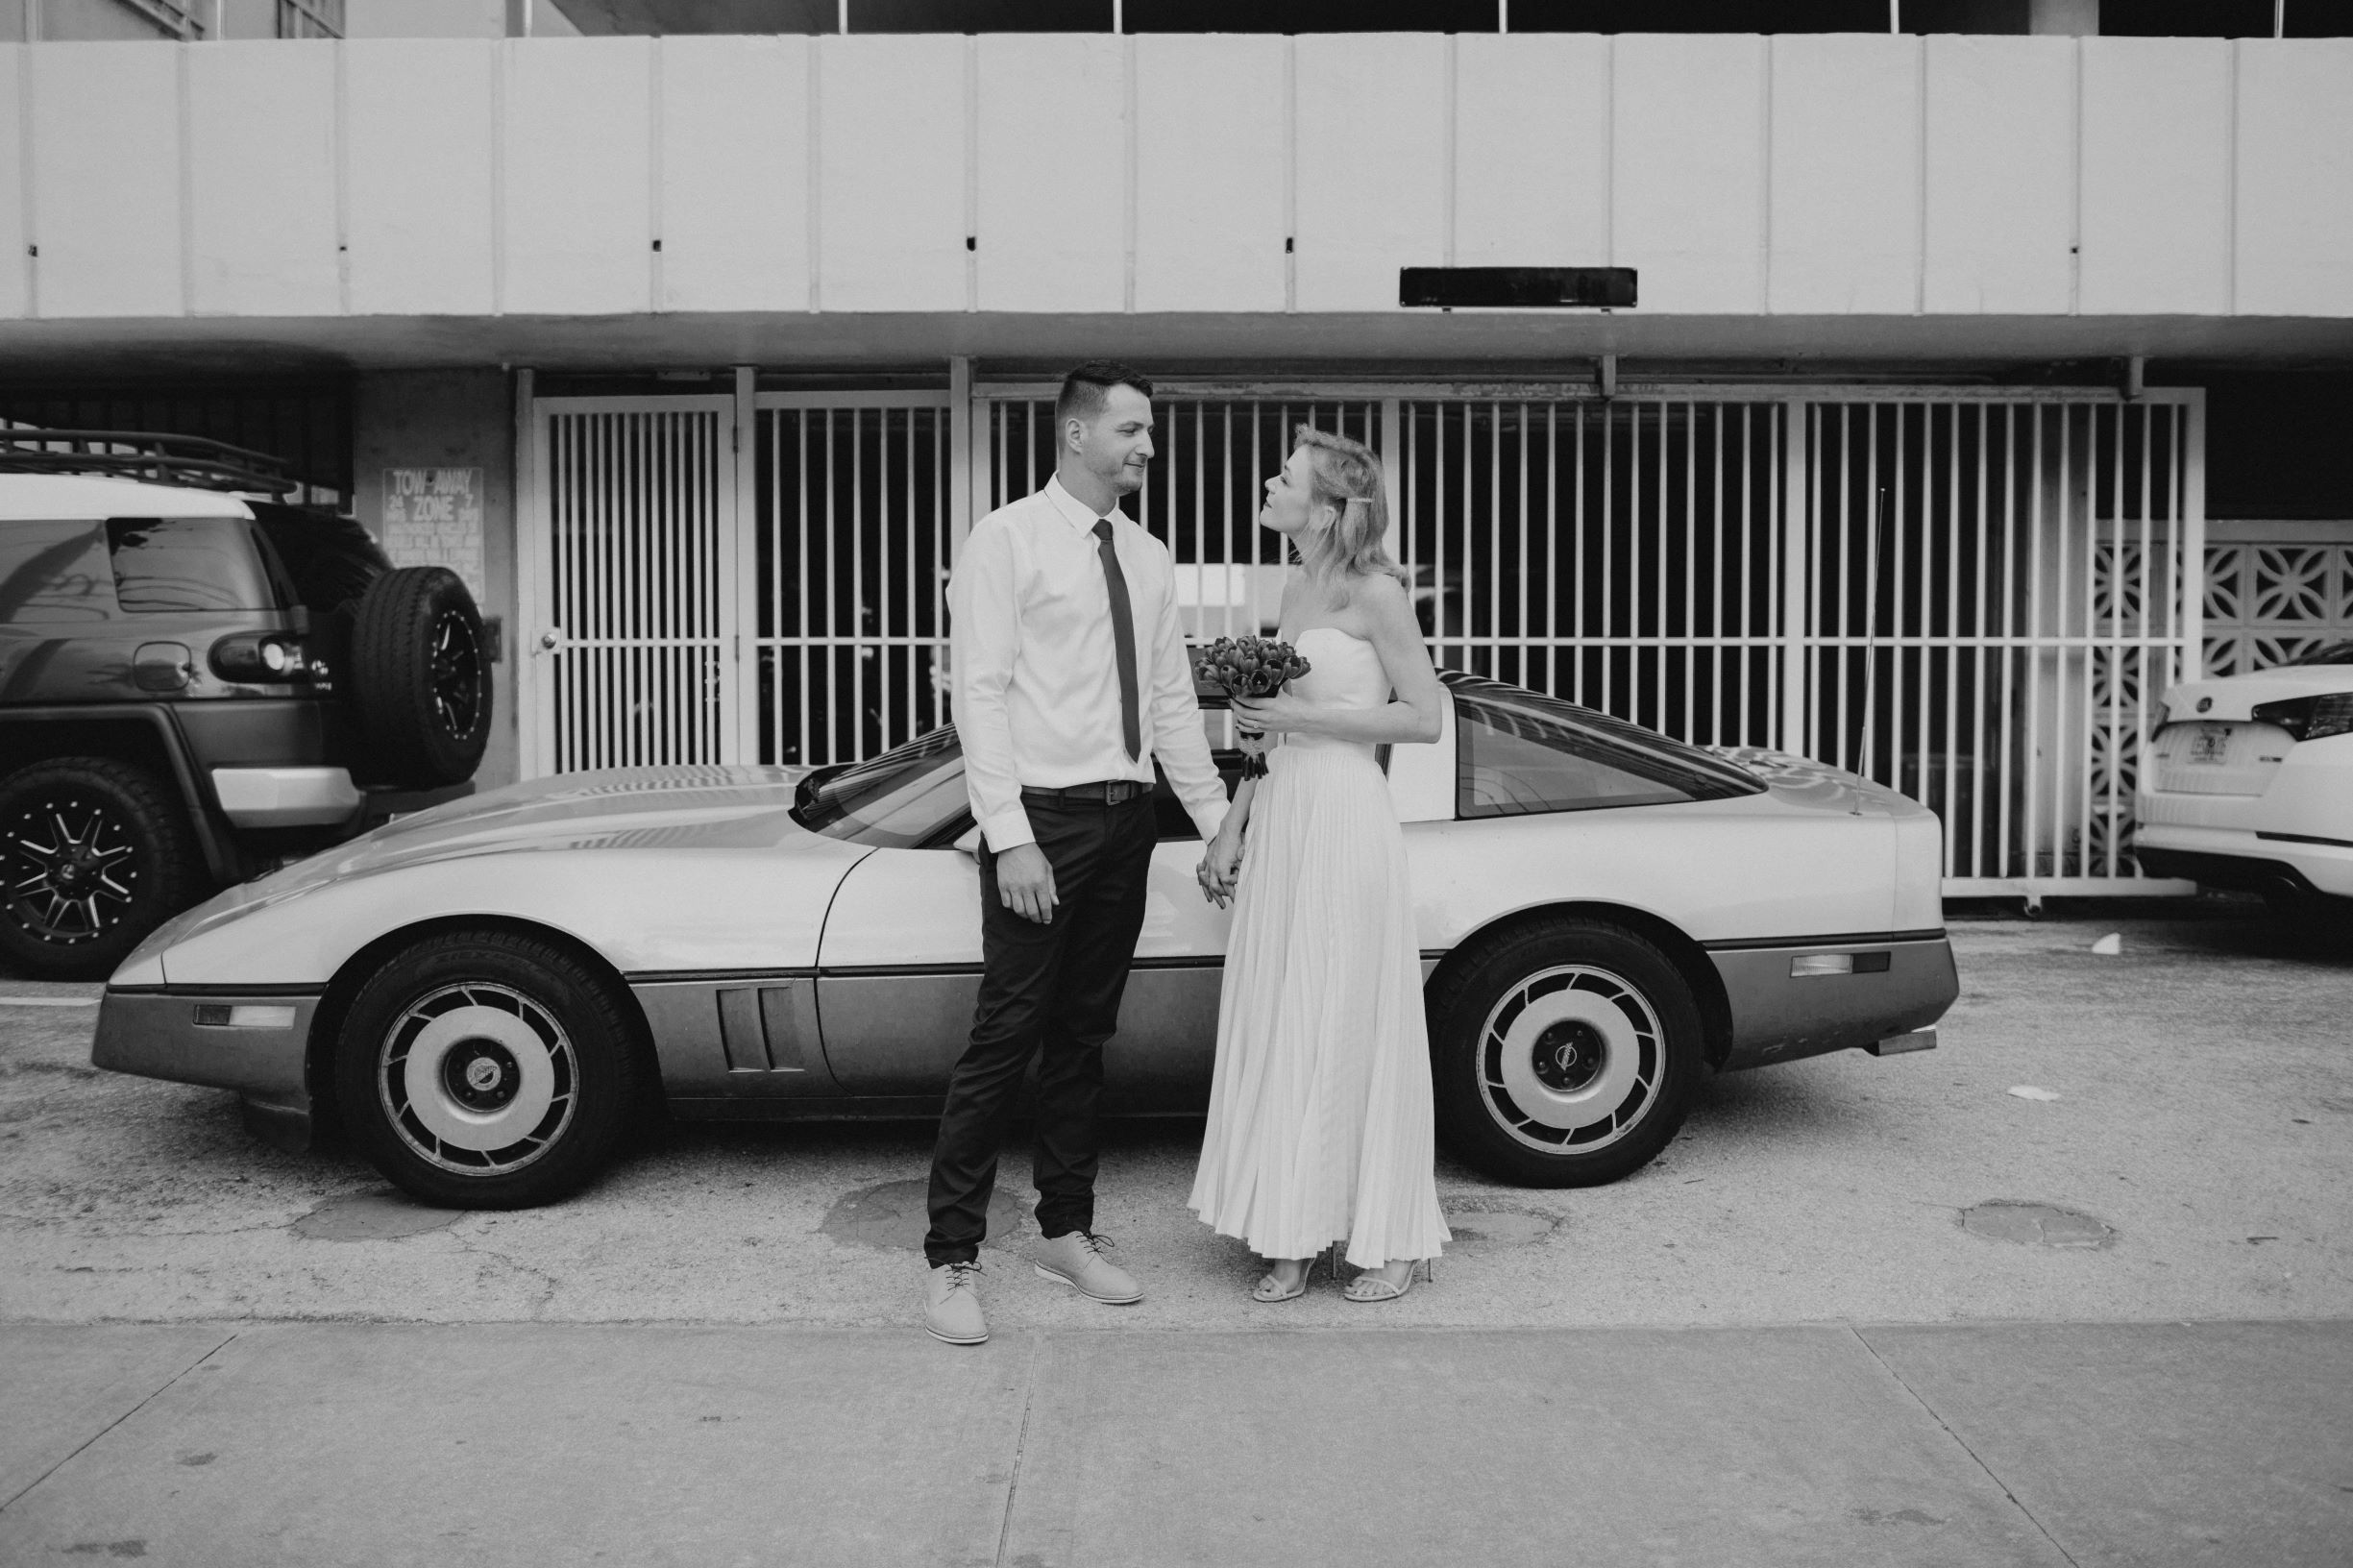 https://0201.nccdn.net/1_2/000/000/08e/fc6/corvette-couple.jpeg